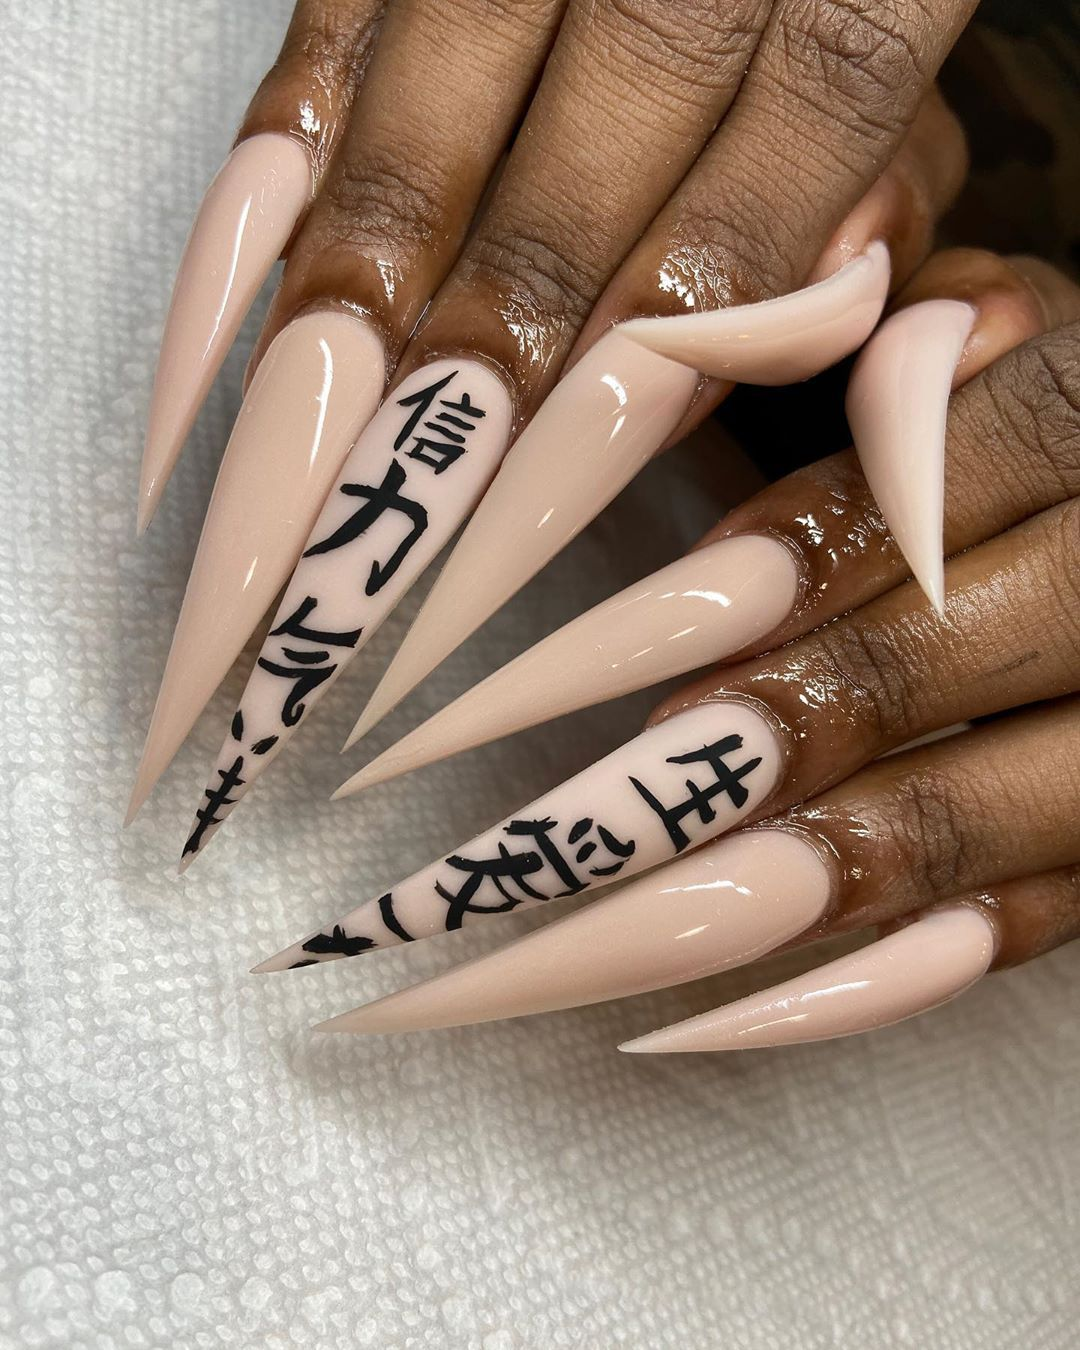 "Nail Tech on Instagram: ""China Doll ❤️ @grabbers_bycyn @crylicsyouneed #atlnailtech #houston #houstonnailtech #houstonnails #houstontx #nailsofinstagram #nails…"""